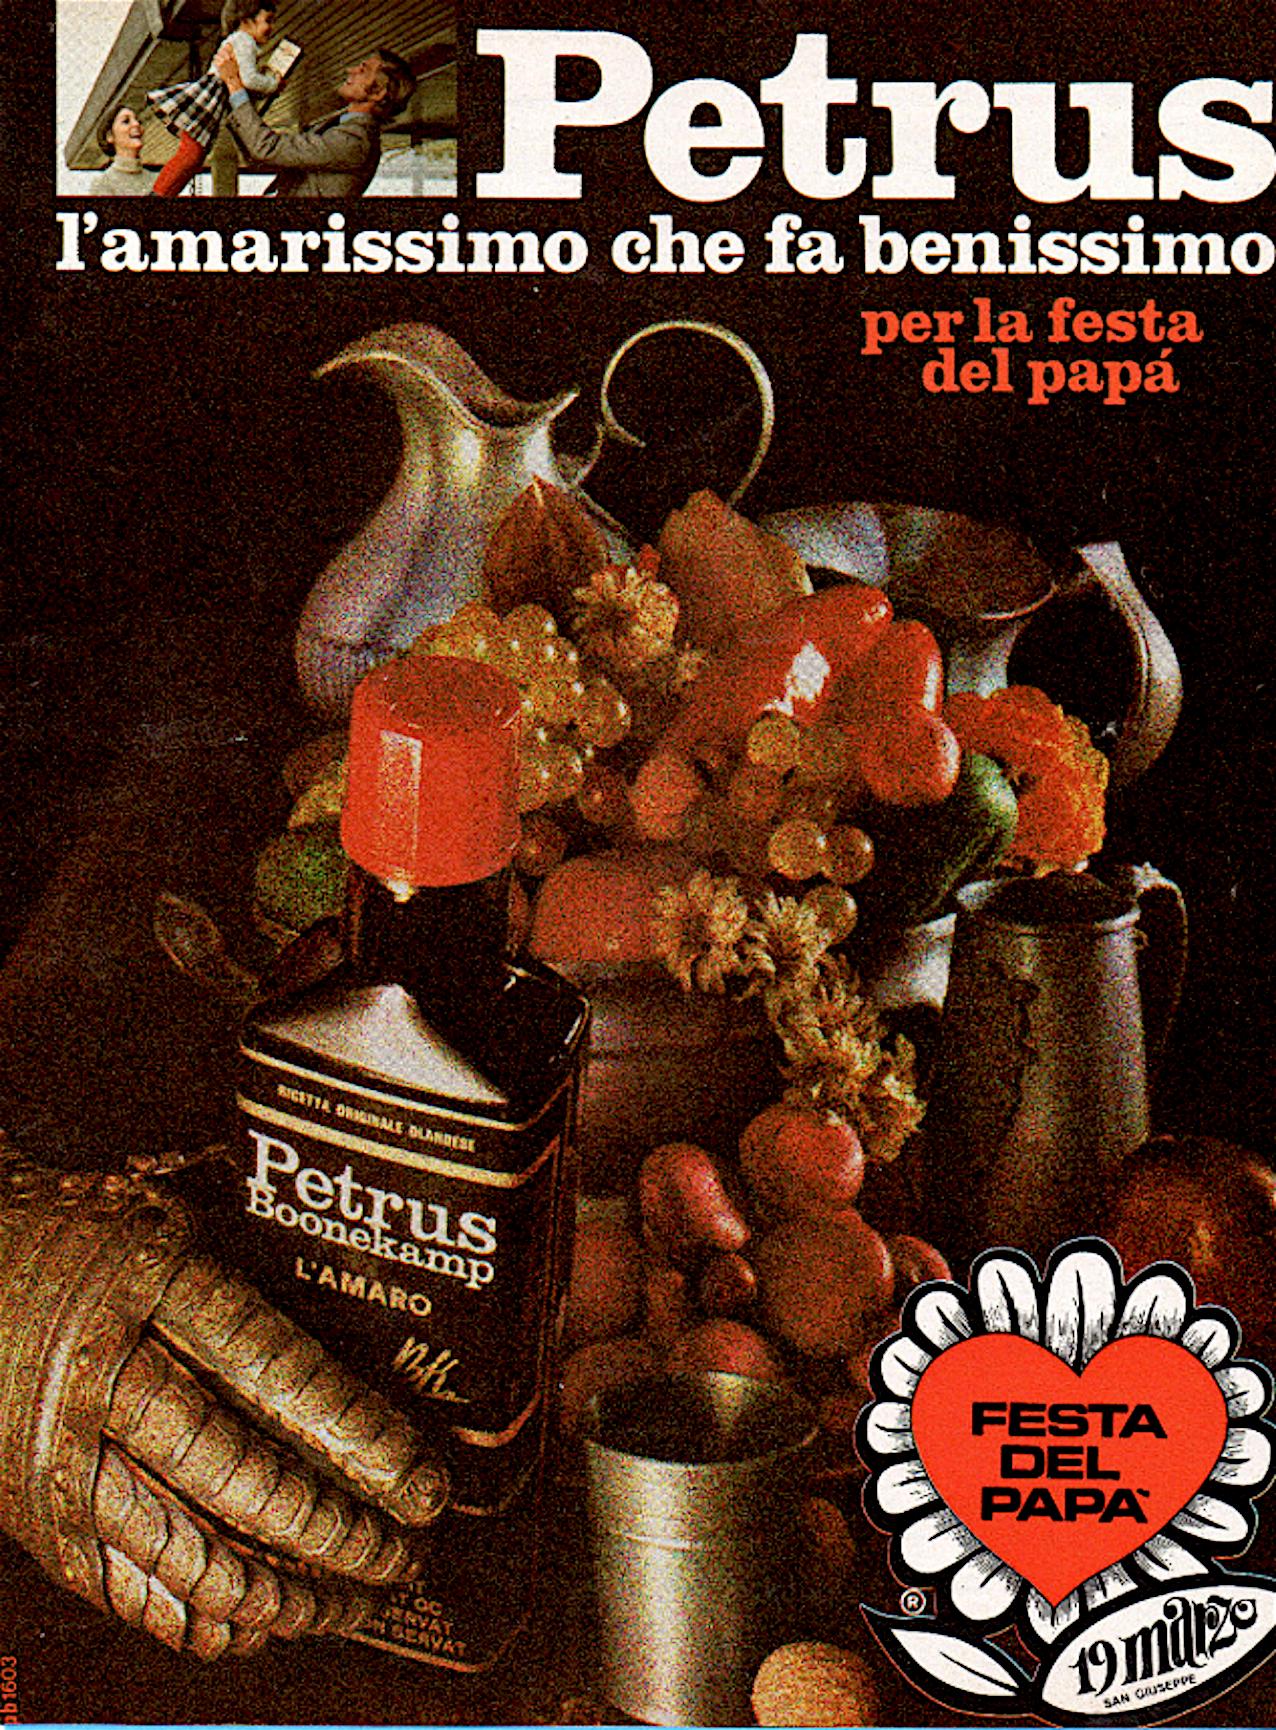 petrus_amarissimo_che_fa_benissimo_carosello